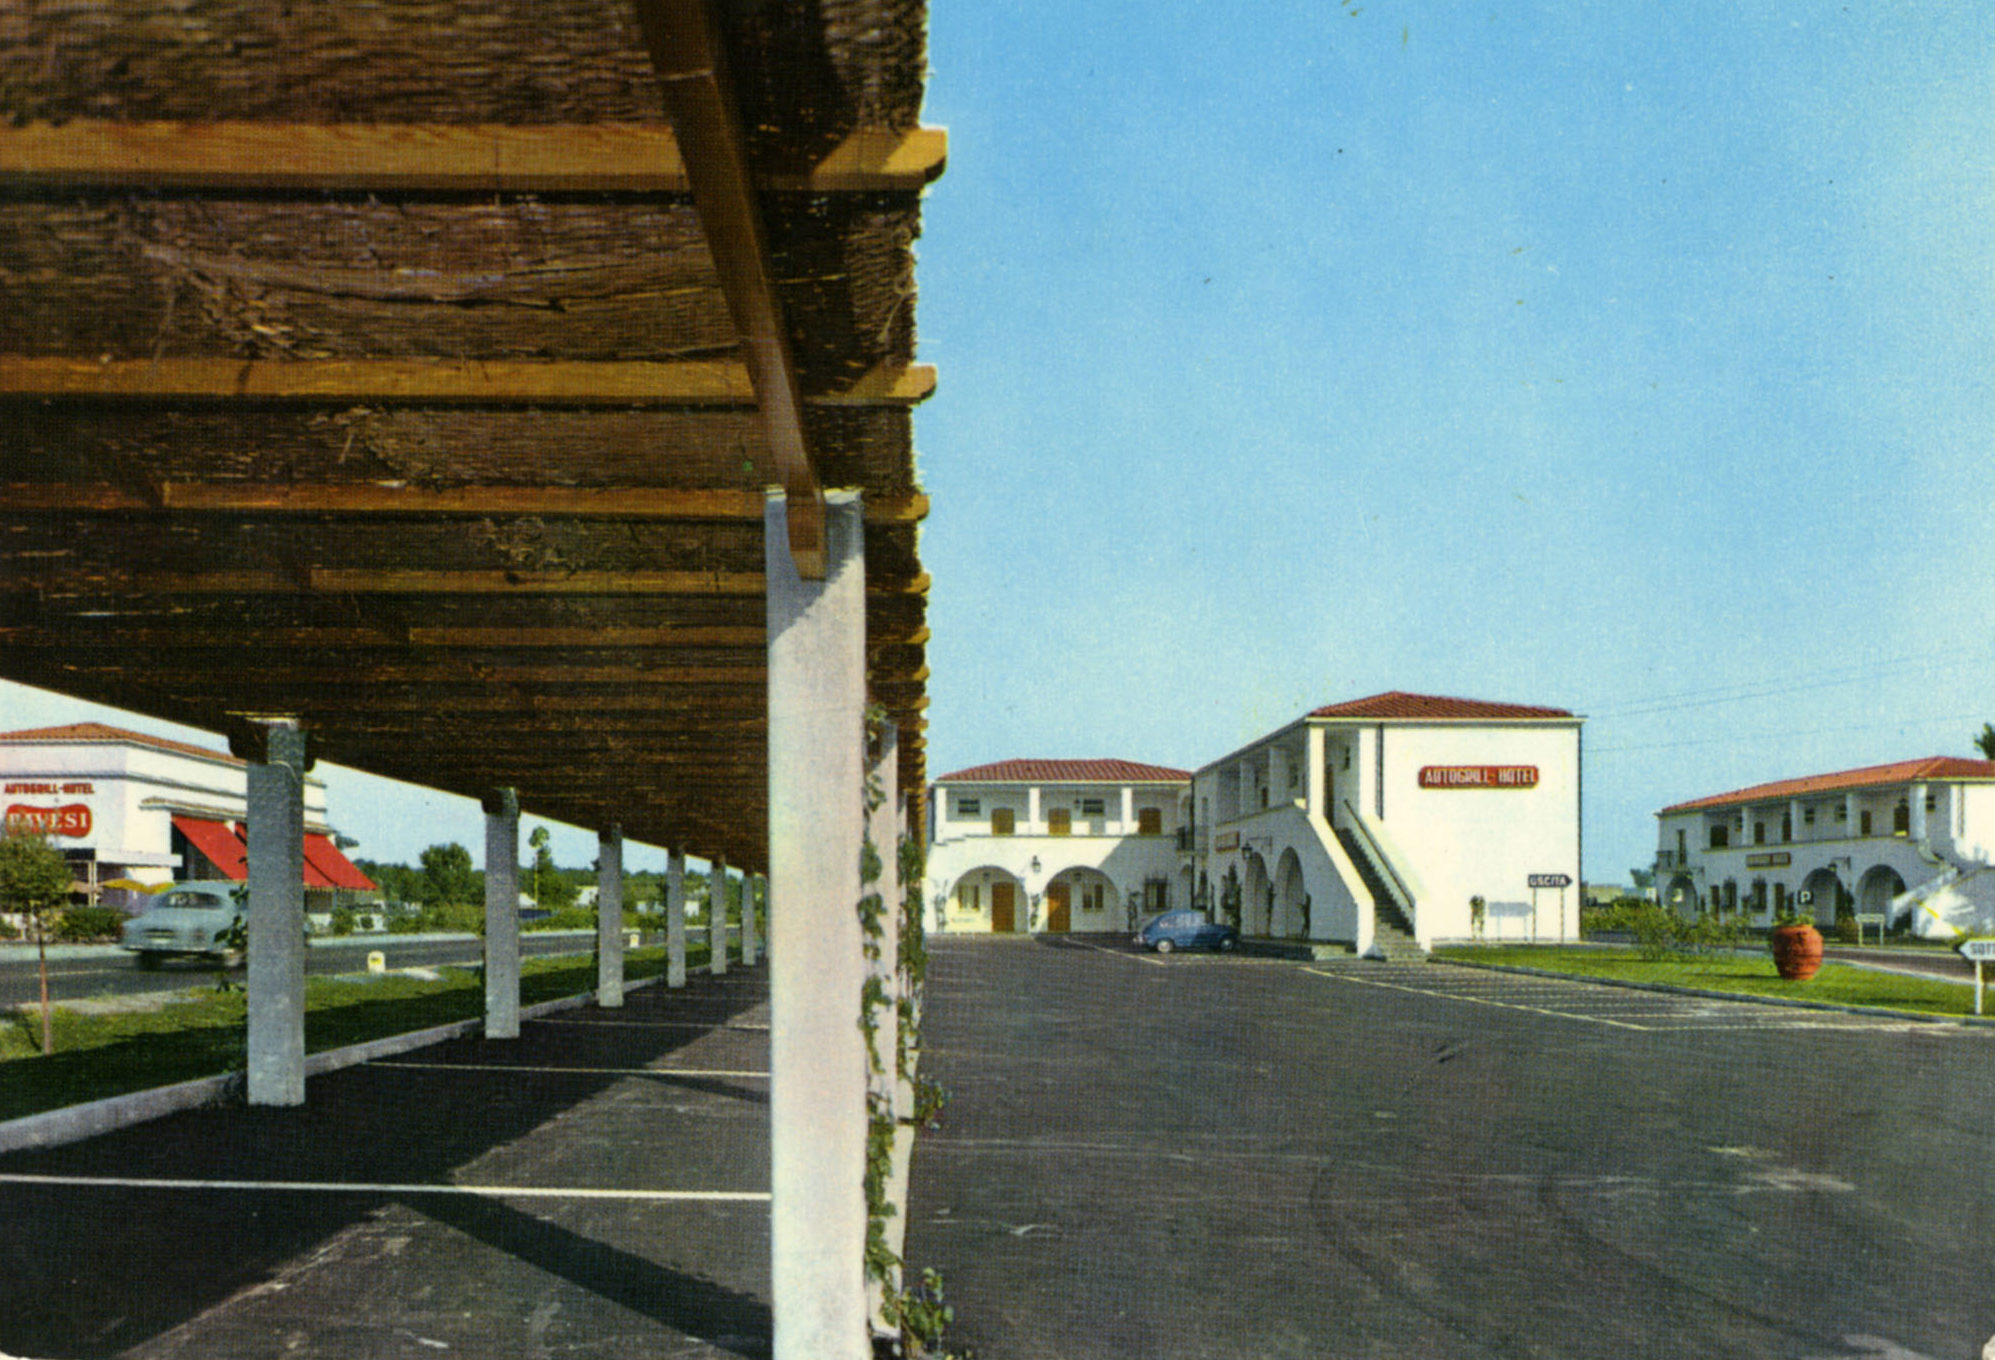 Cartoline Autogrill Pavesi - Torre Annunziata